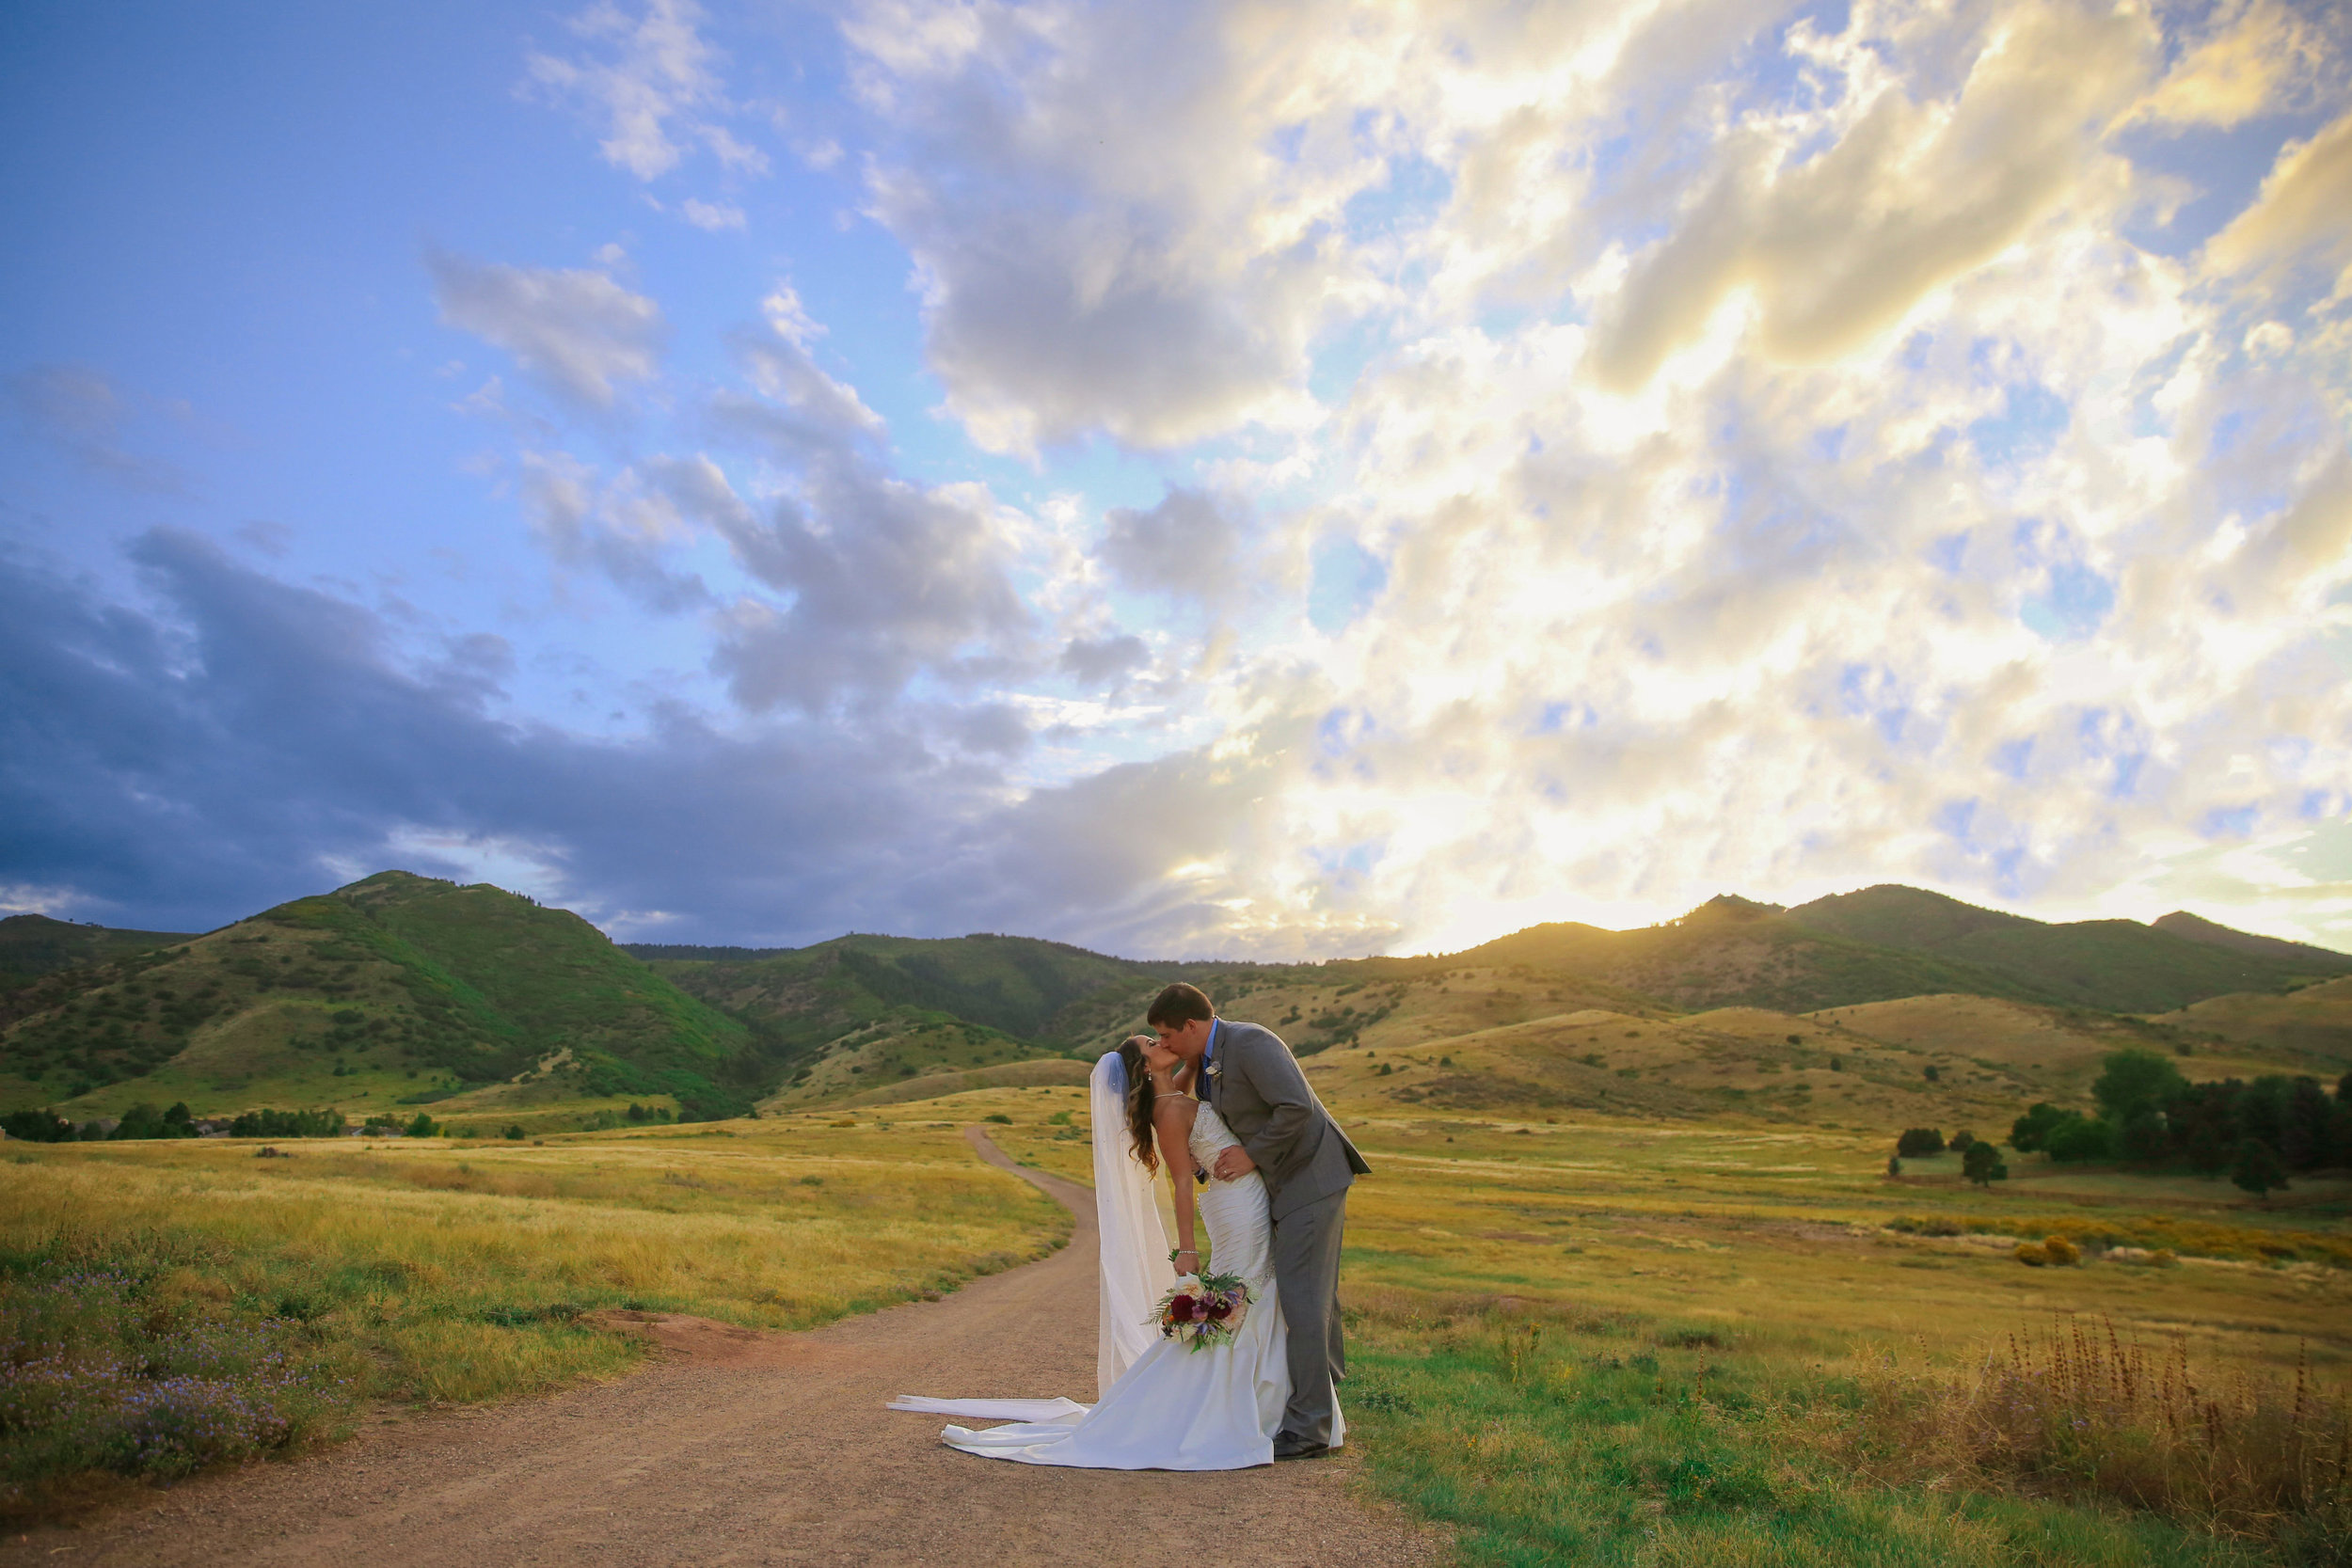 -colorado-wedding-photographer-denver-springs-vail-the-manor-house-